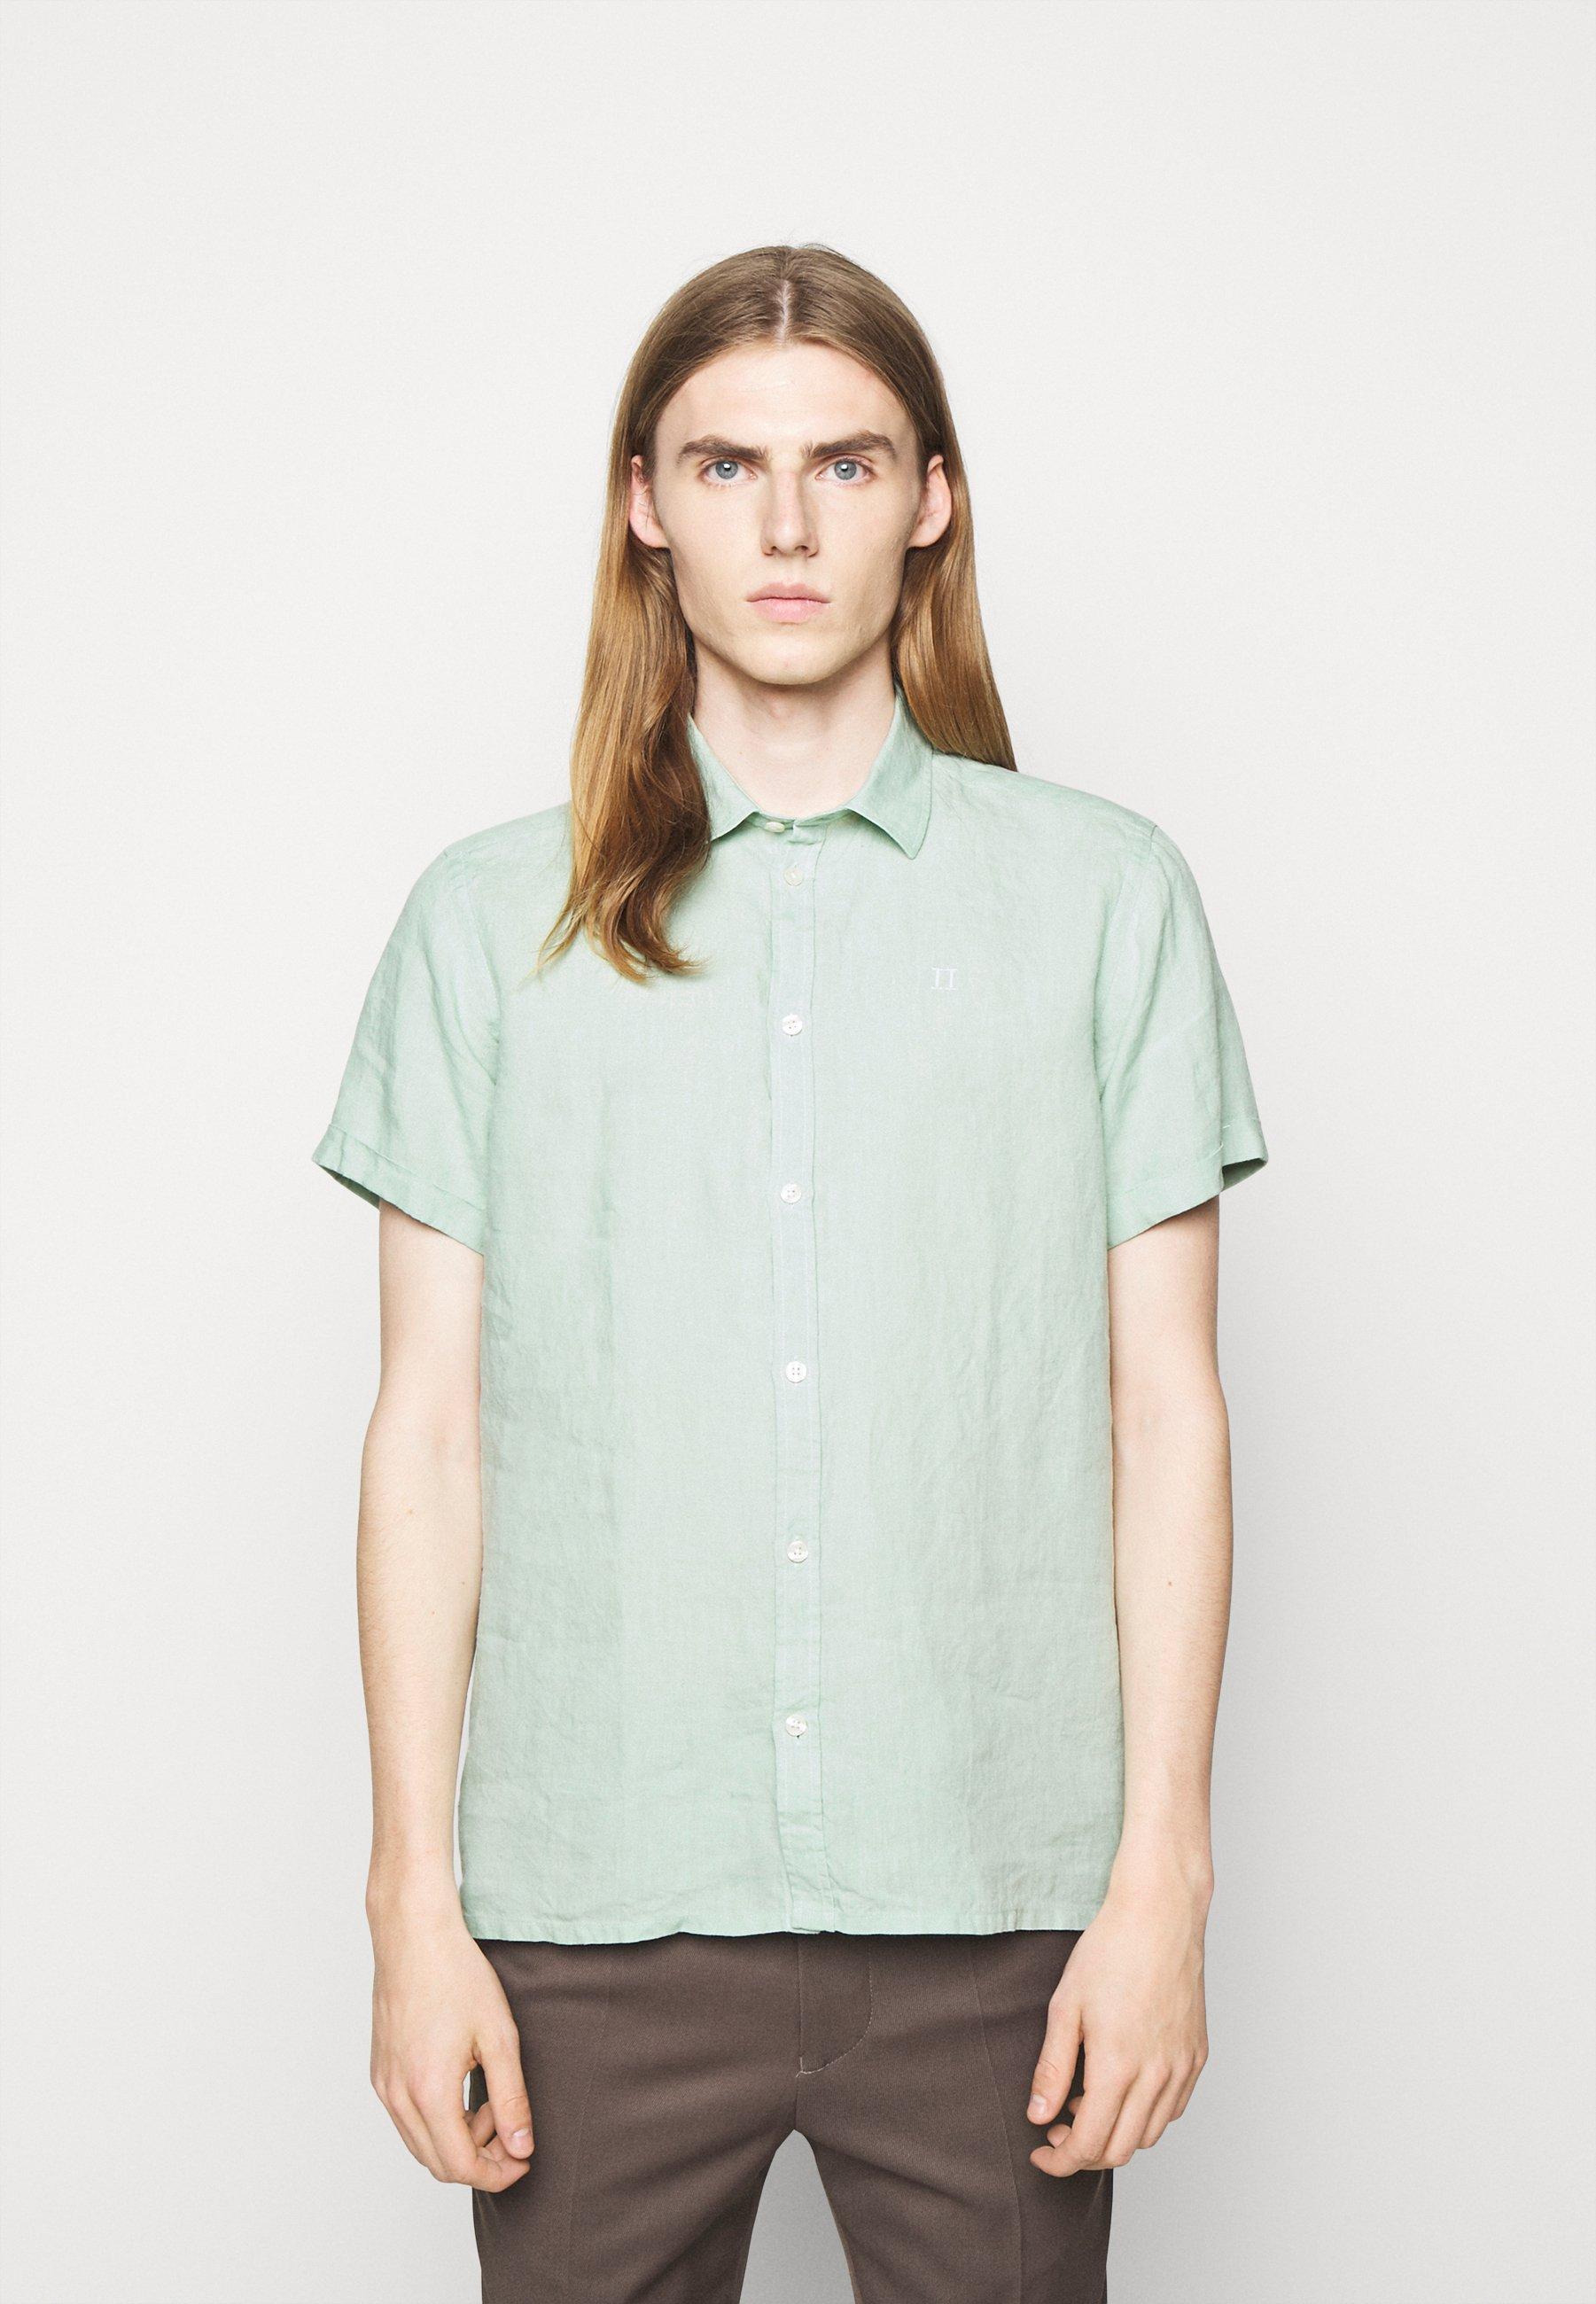 Uomo LANDO  - Camicia